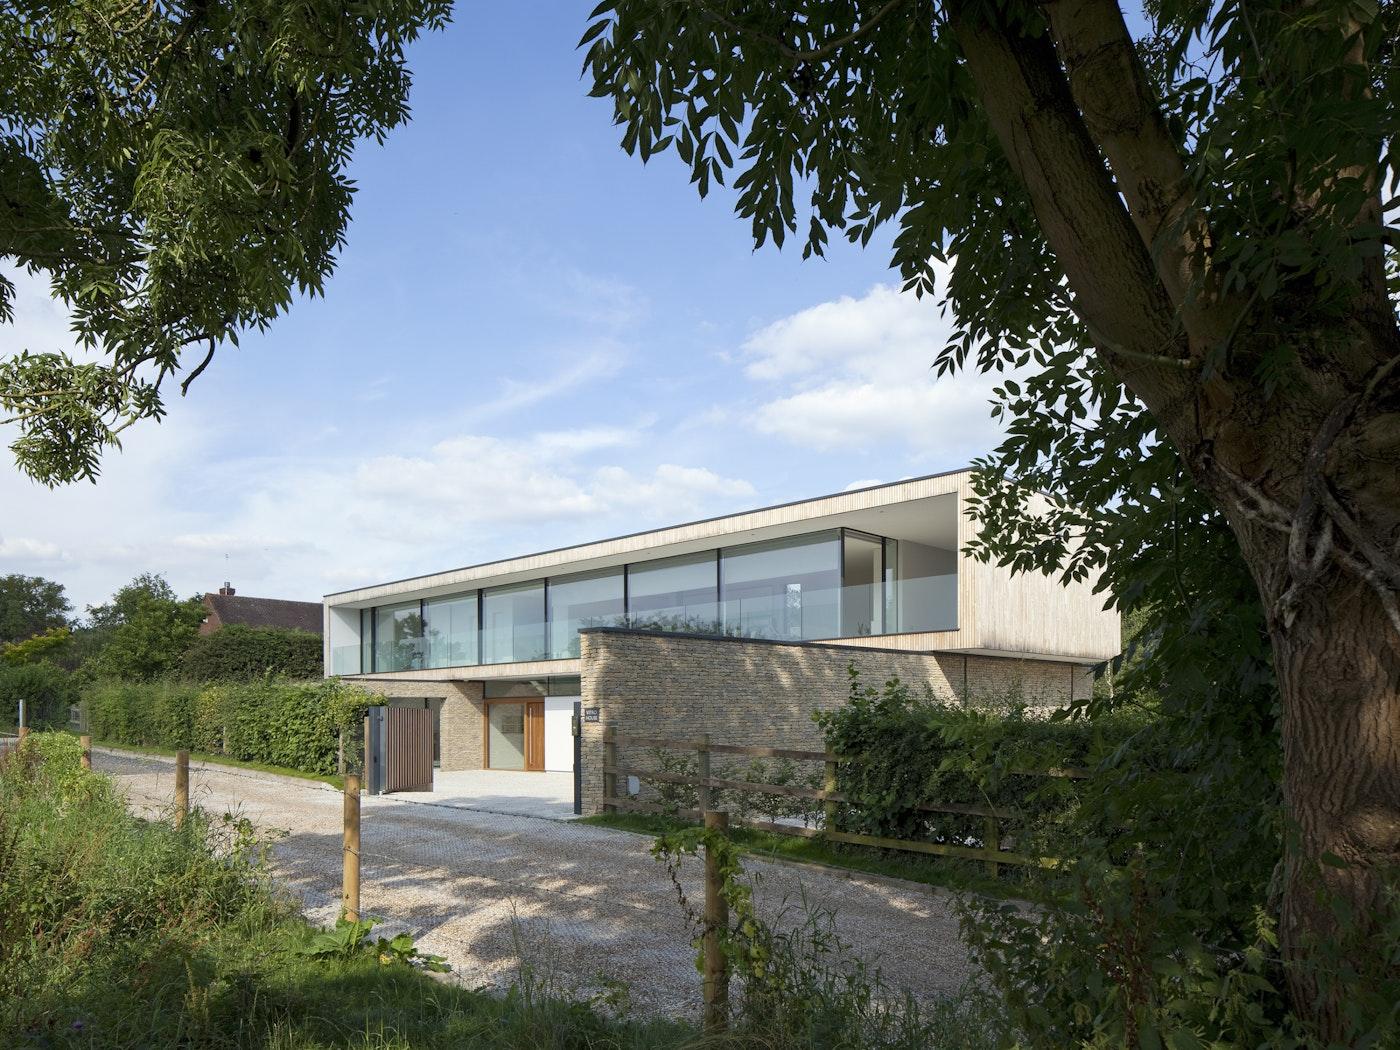 Award winning house design featuring Urban Front's Porto front door